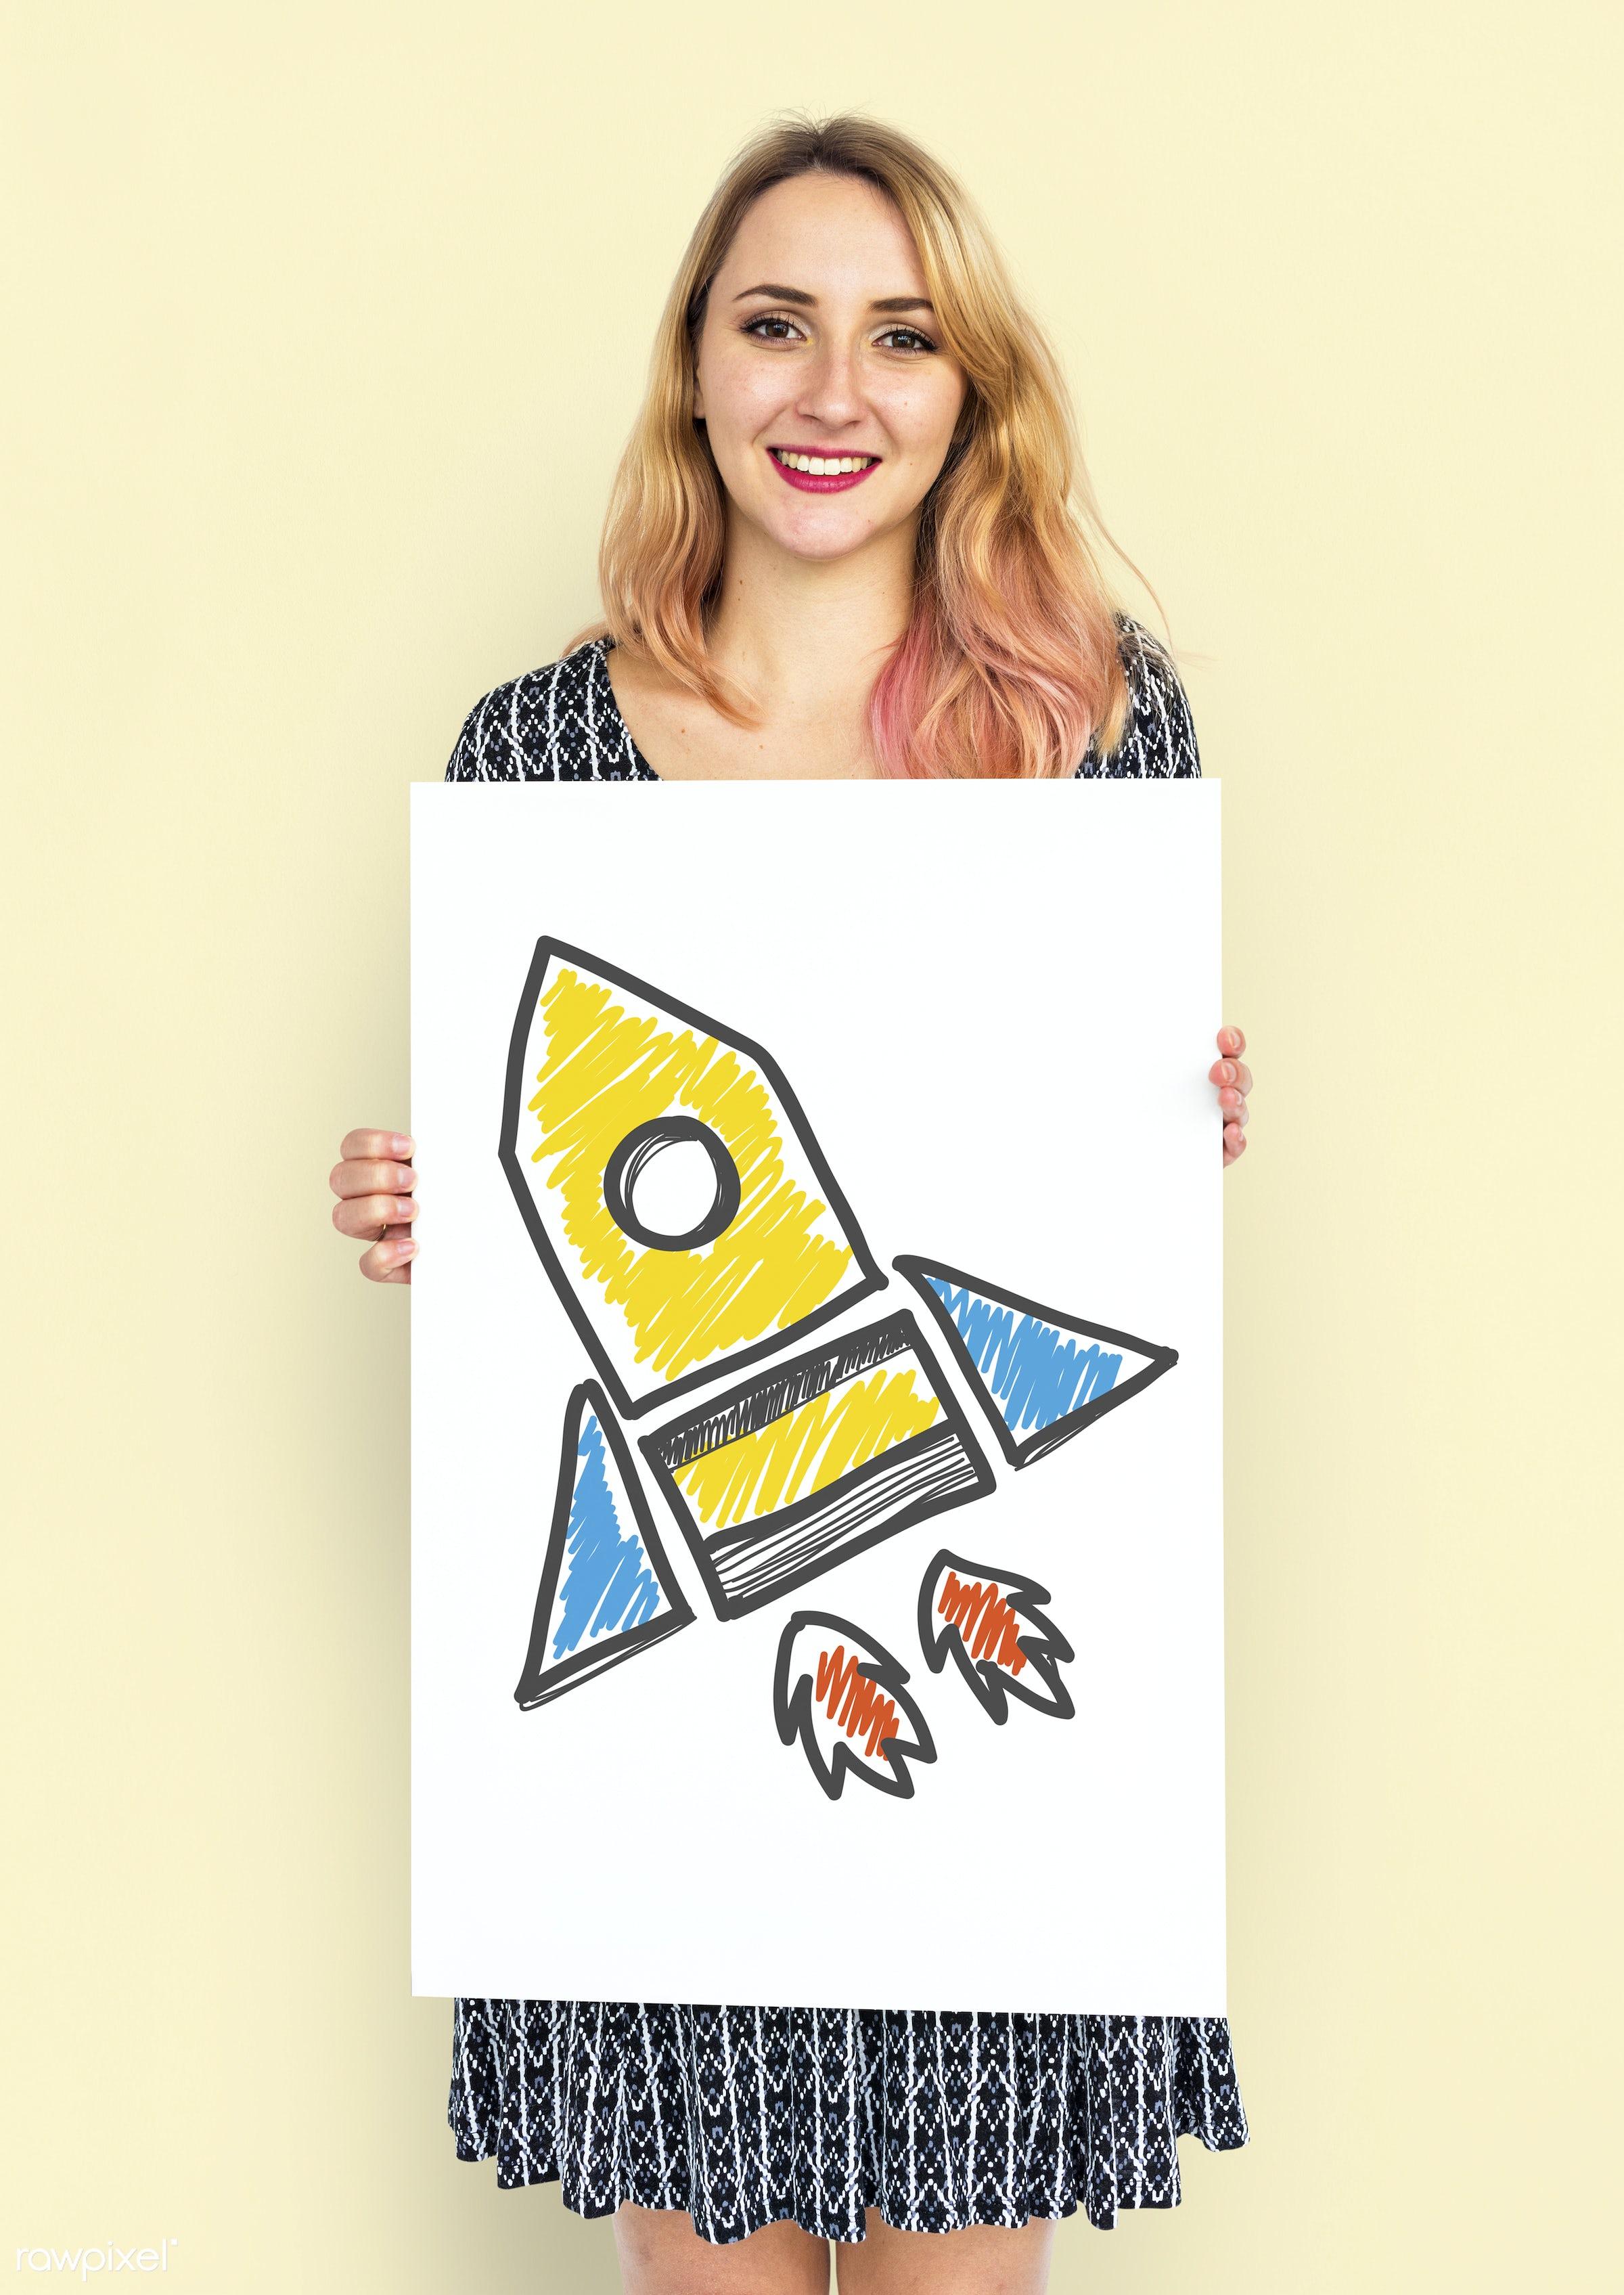 studio, expression, pastel, person, technology, emblem, holding, motivation, blond, yellow, people, exploration, science,...